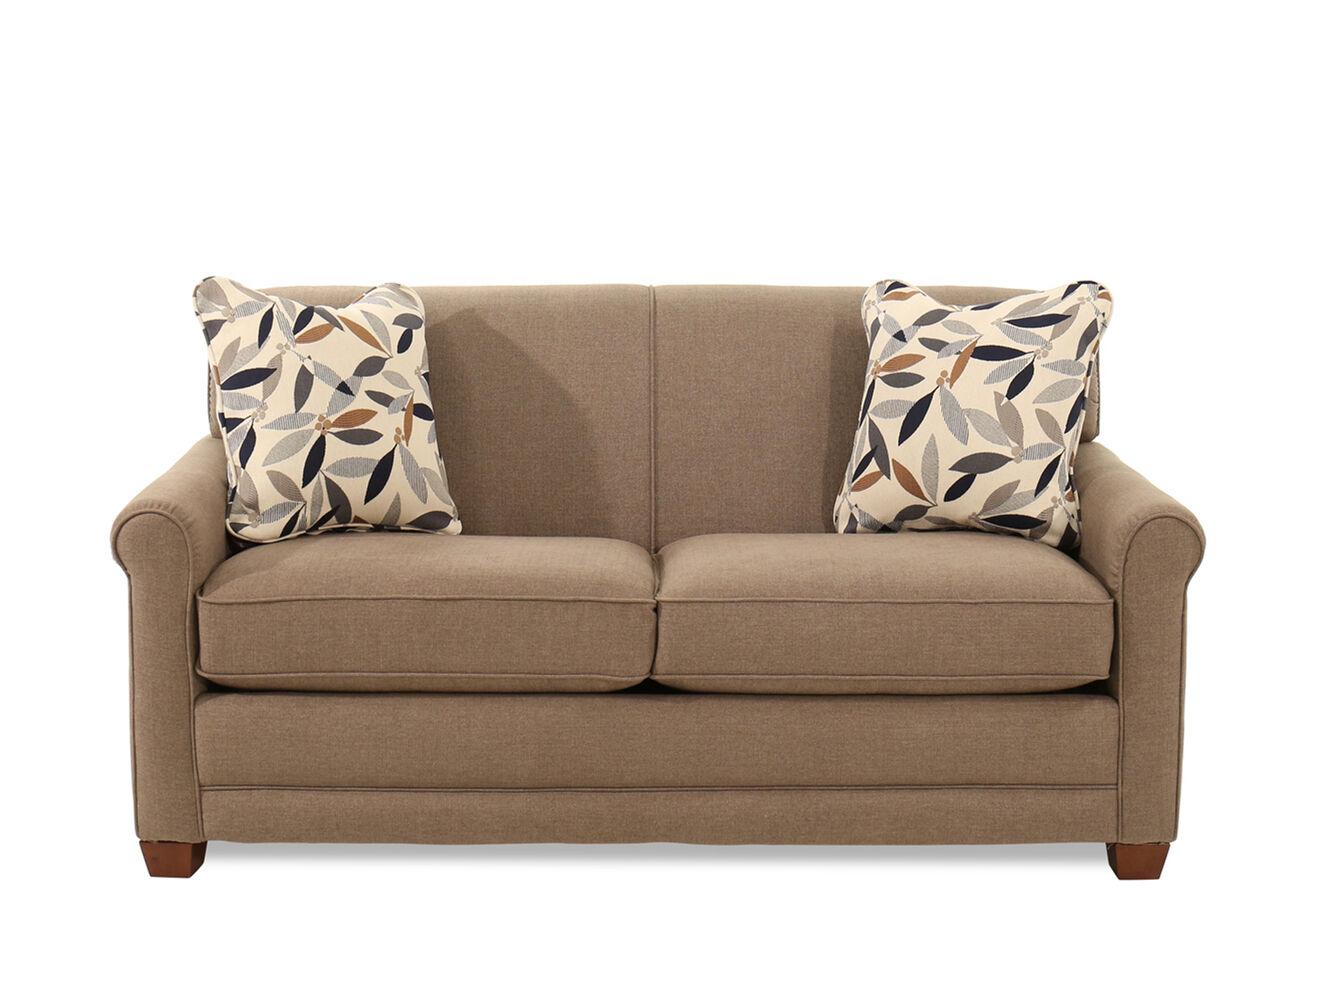 La Z Boy Premier Supreme Comfort Full Sleeper Sofa